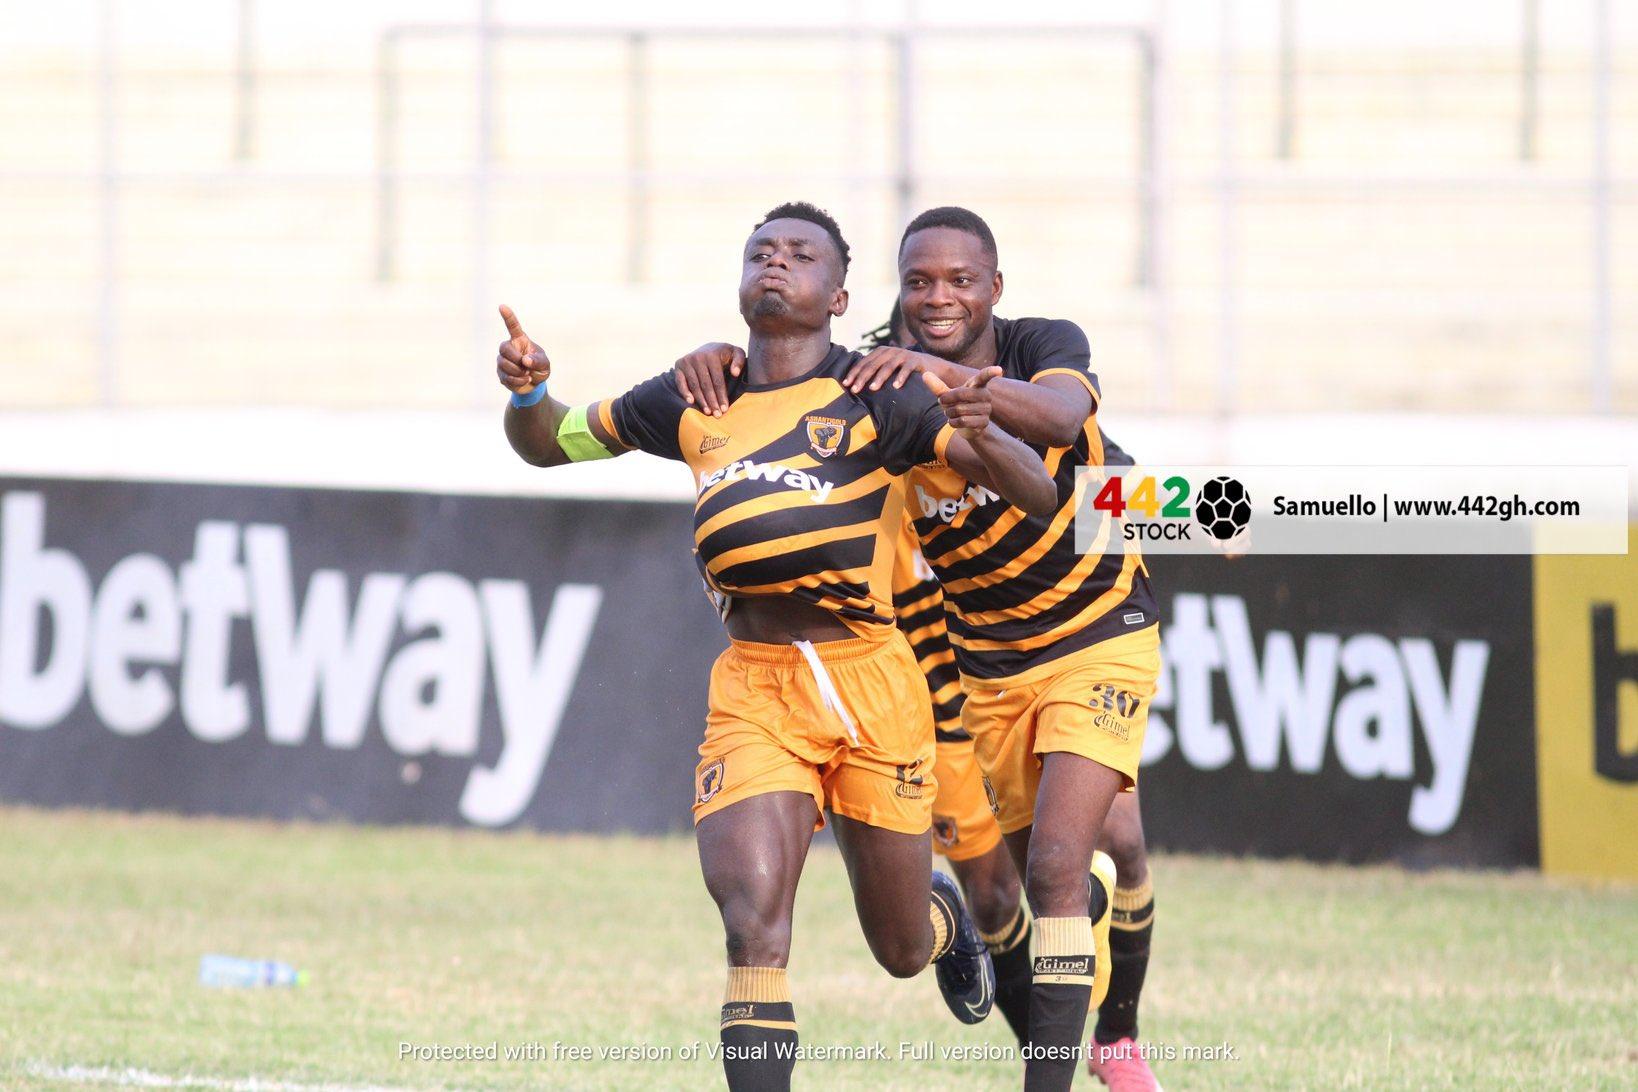 GPLwk19: Victor Aidoo misses penalty but Ashantigold convert late spot kick  to steal win [VIDEO] – Citi Sports Online